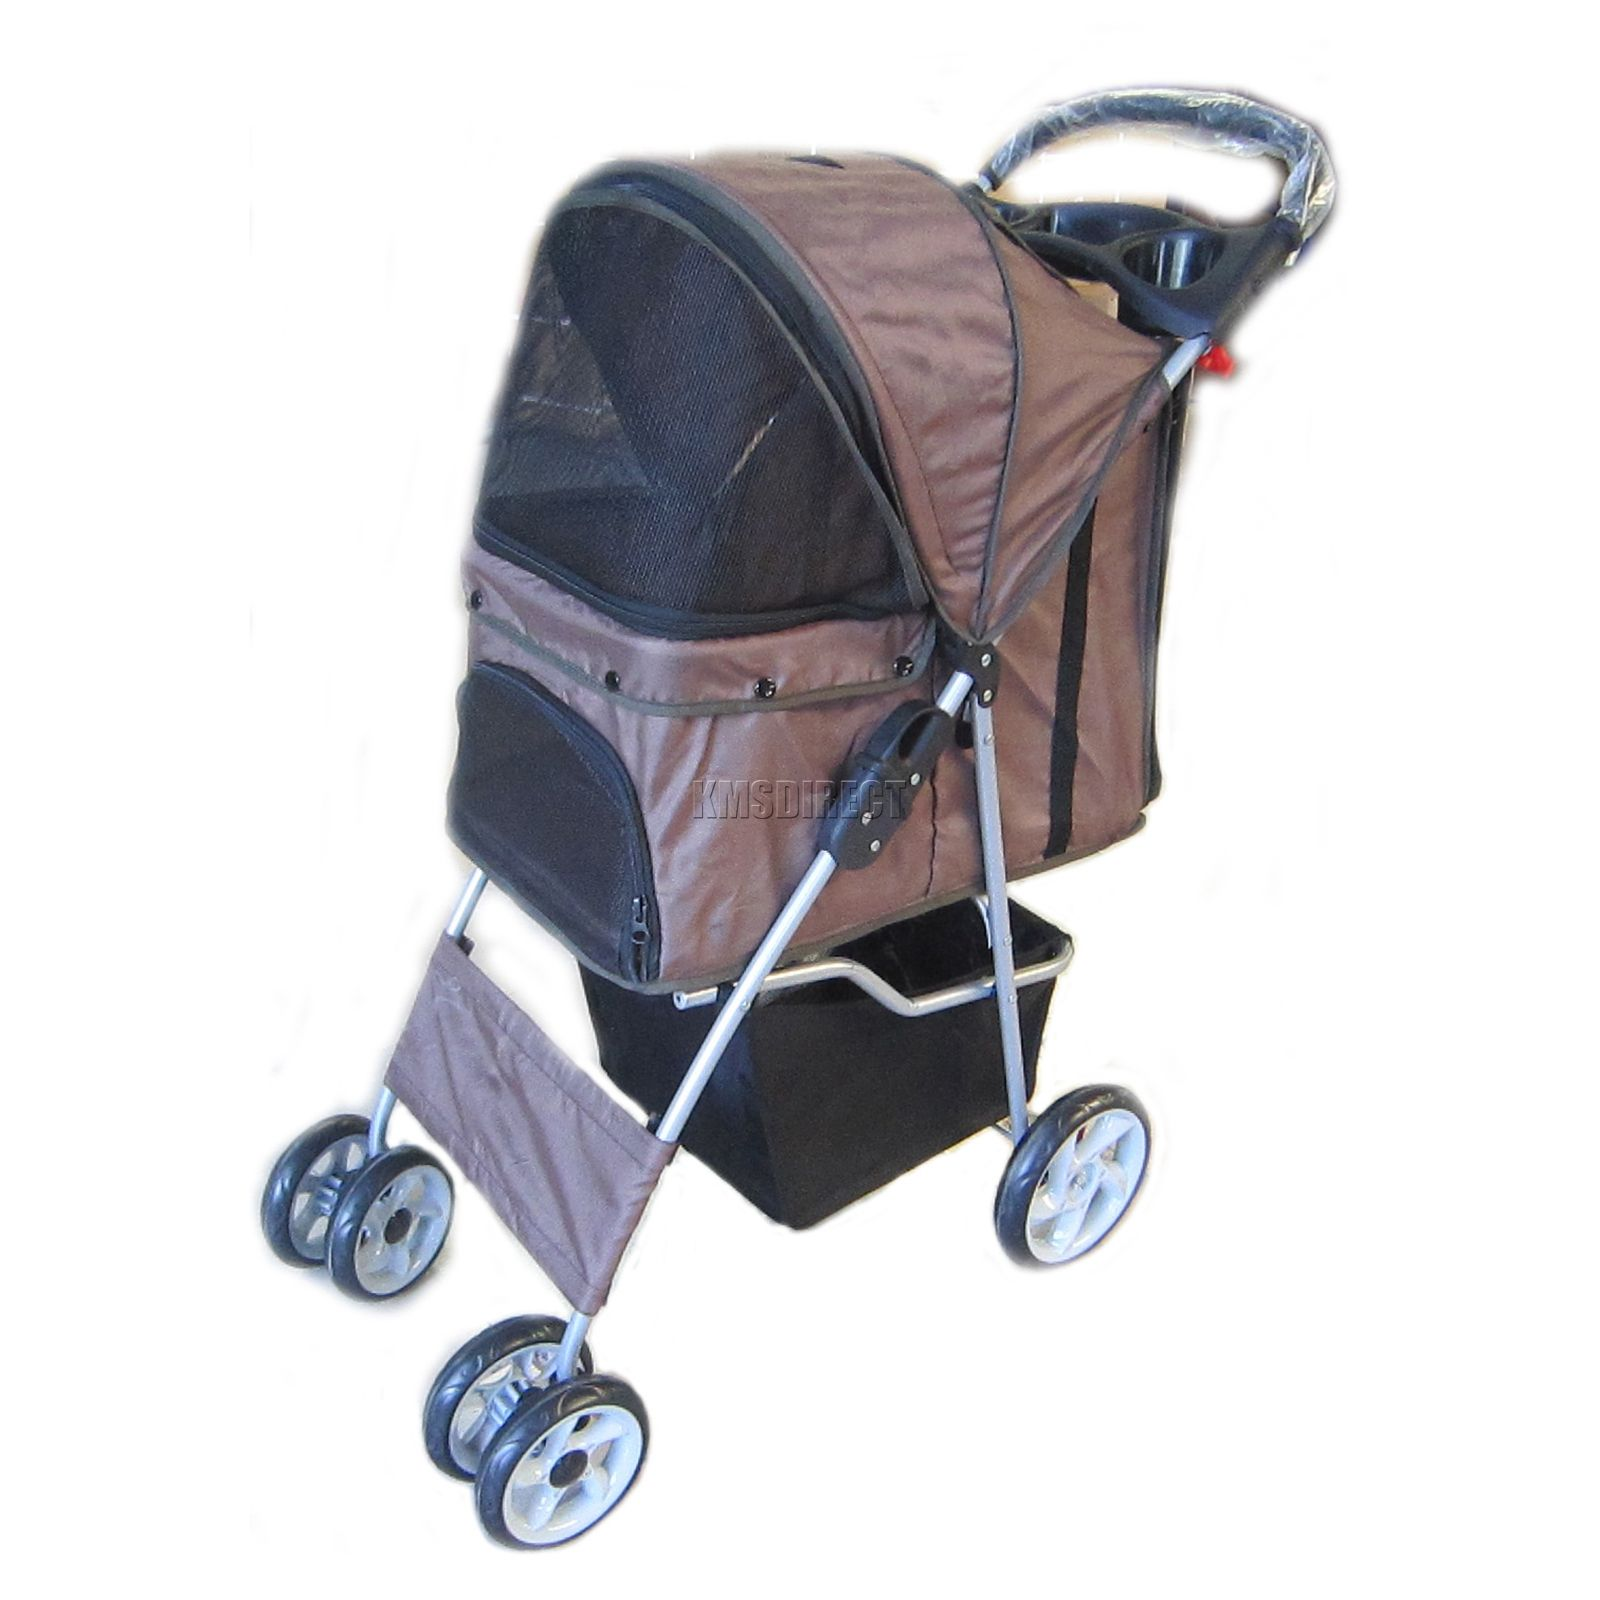 Pet pushchair dog puppy cat pram travel buggy stroller